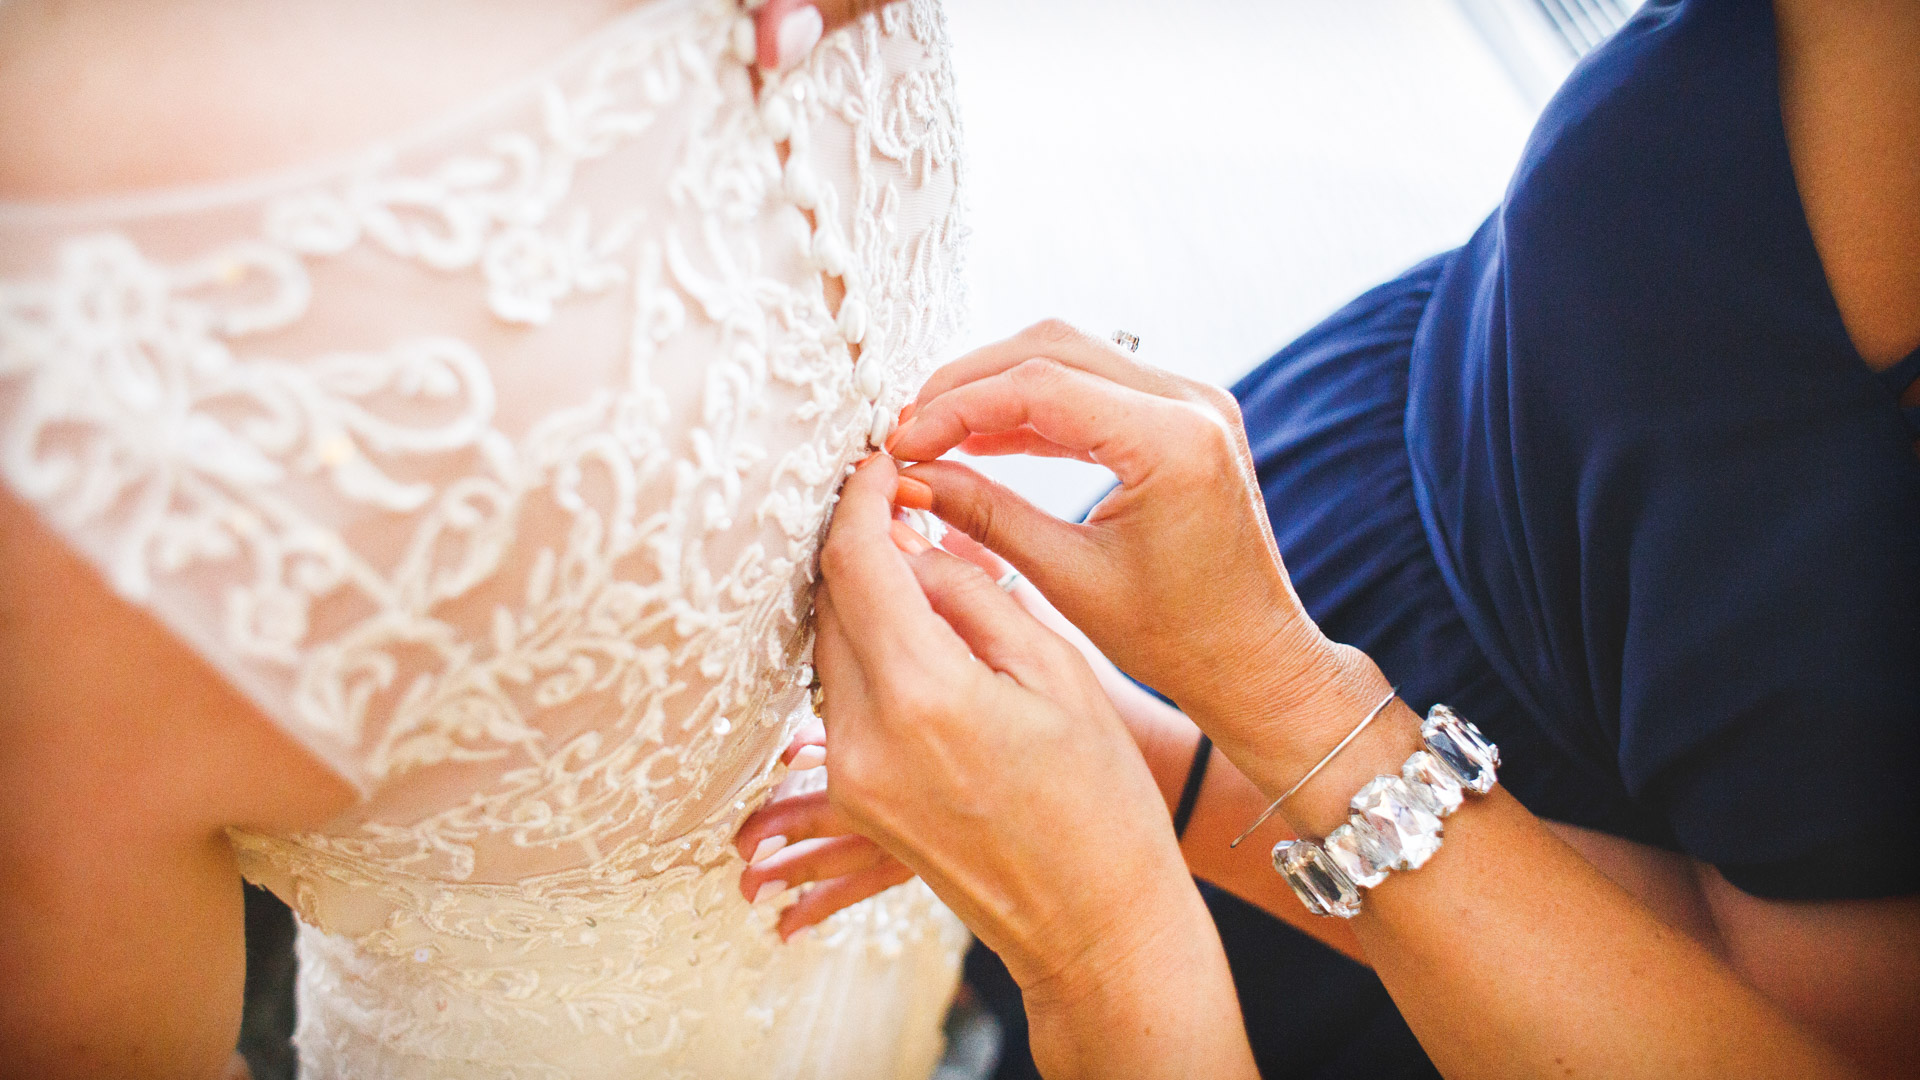 Bride-dress-buttoning.jpg